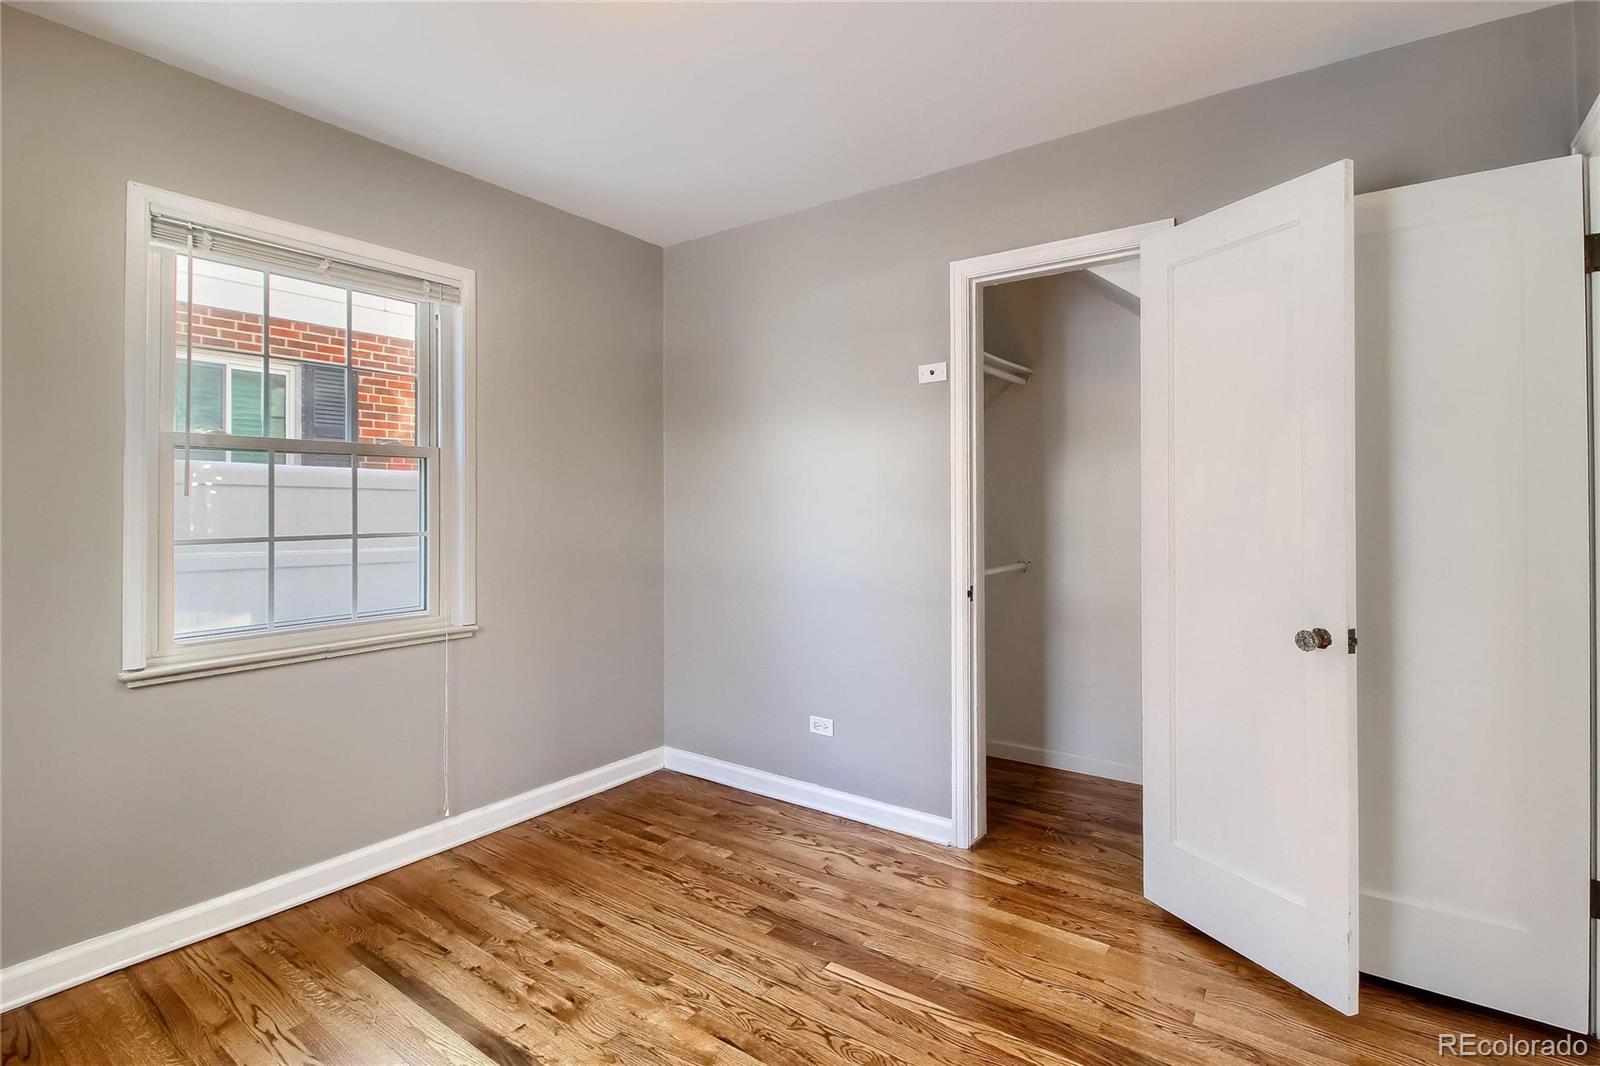 MLS# 8078729 - 24 - 1100 S Garfield Street, Denver, CO 80210